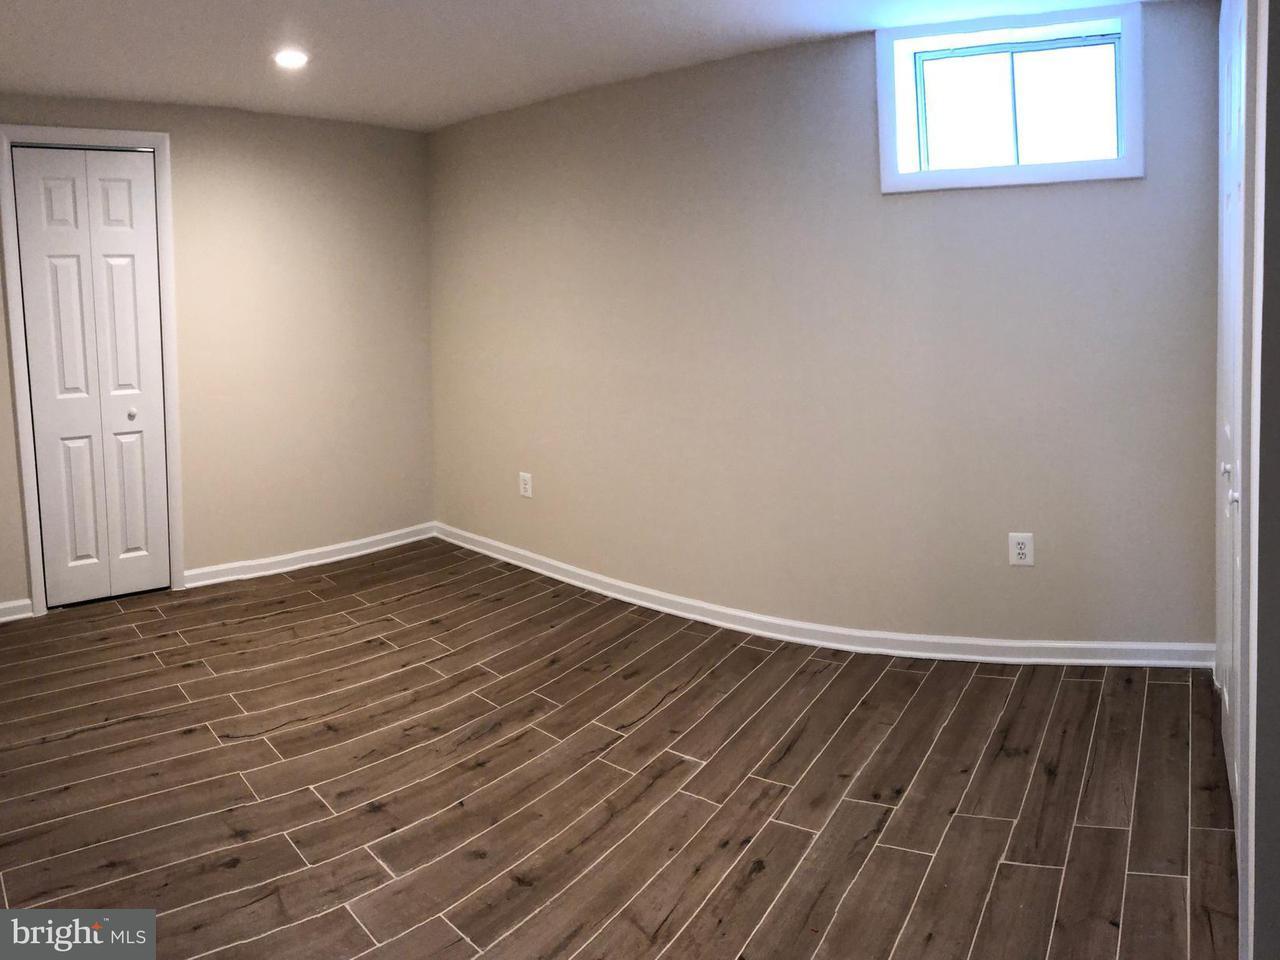 Additional photo for property listing at 3137 Singleton Circle 3137 Singleton Circle Fairfax, Βιρτζινια 22030 Ηνωμενεσ Πολιτειεσ